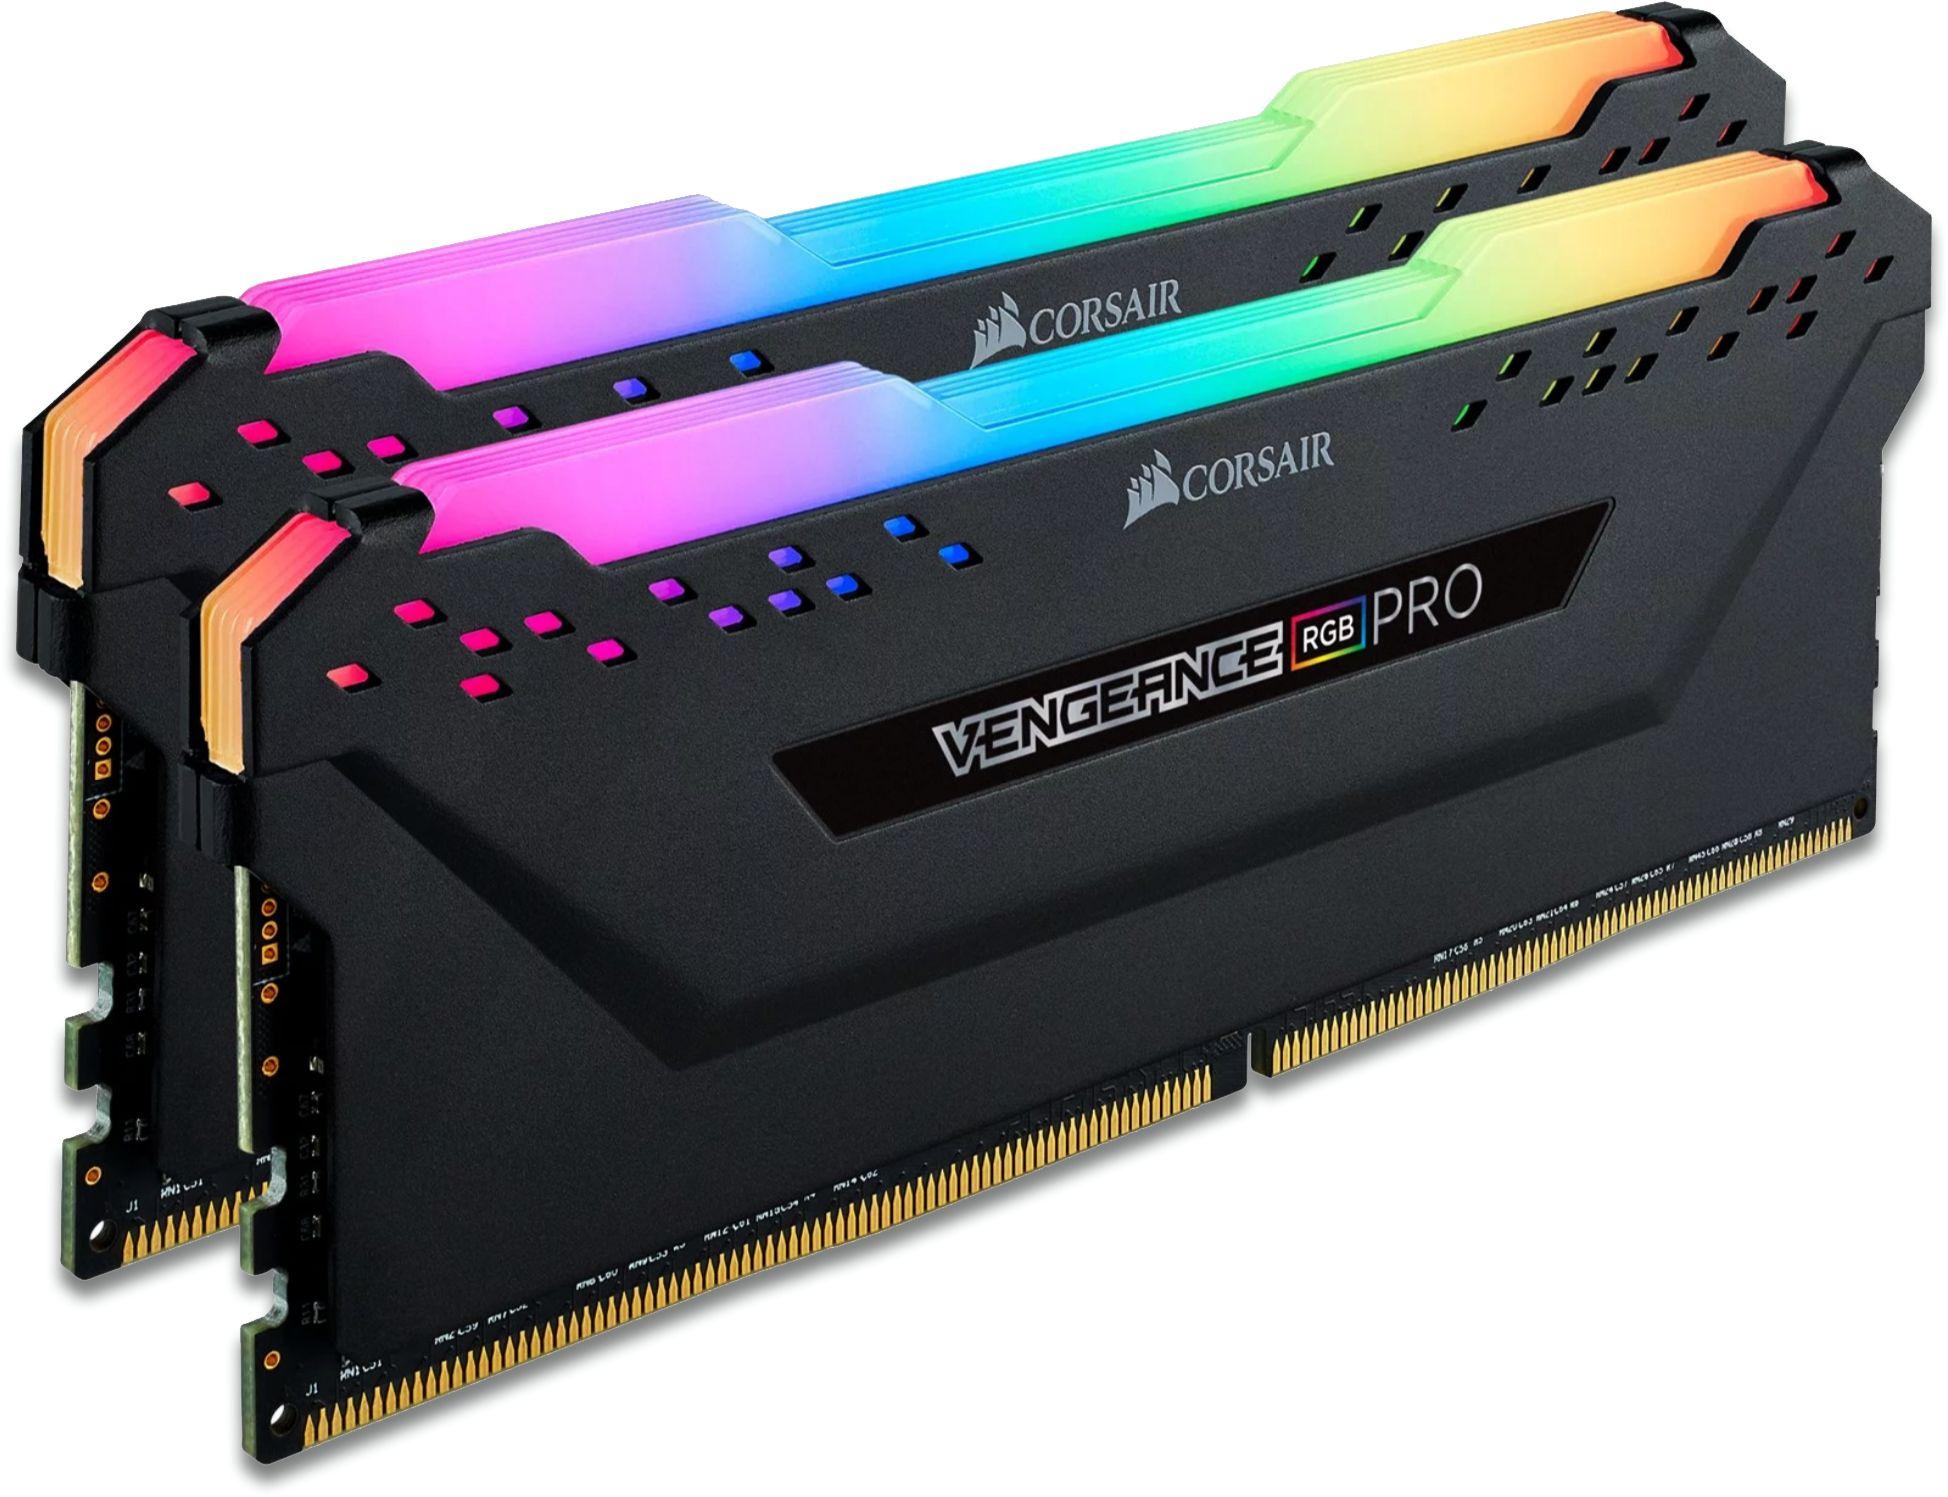 Vengeance RGB PRO 16GB (2x8GB) DDR4 2666MHz Memory